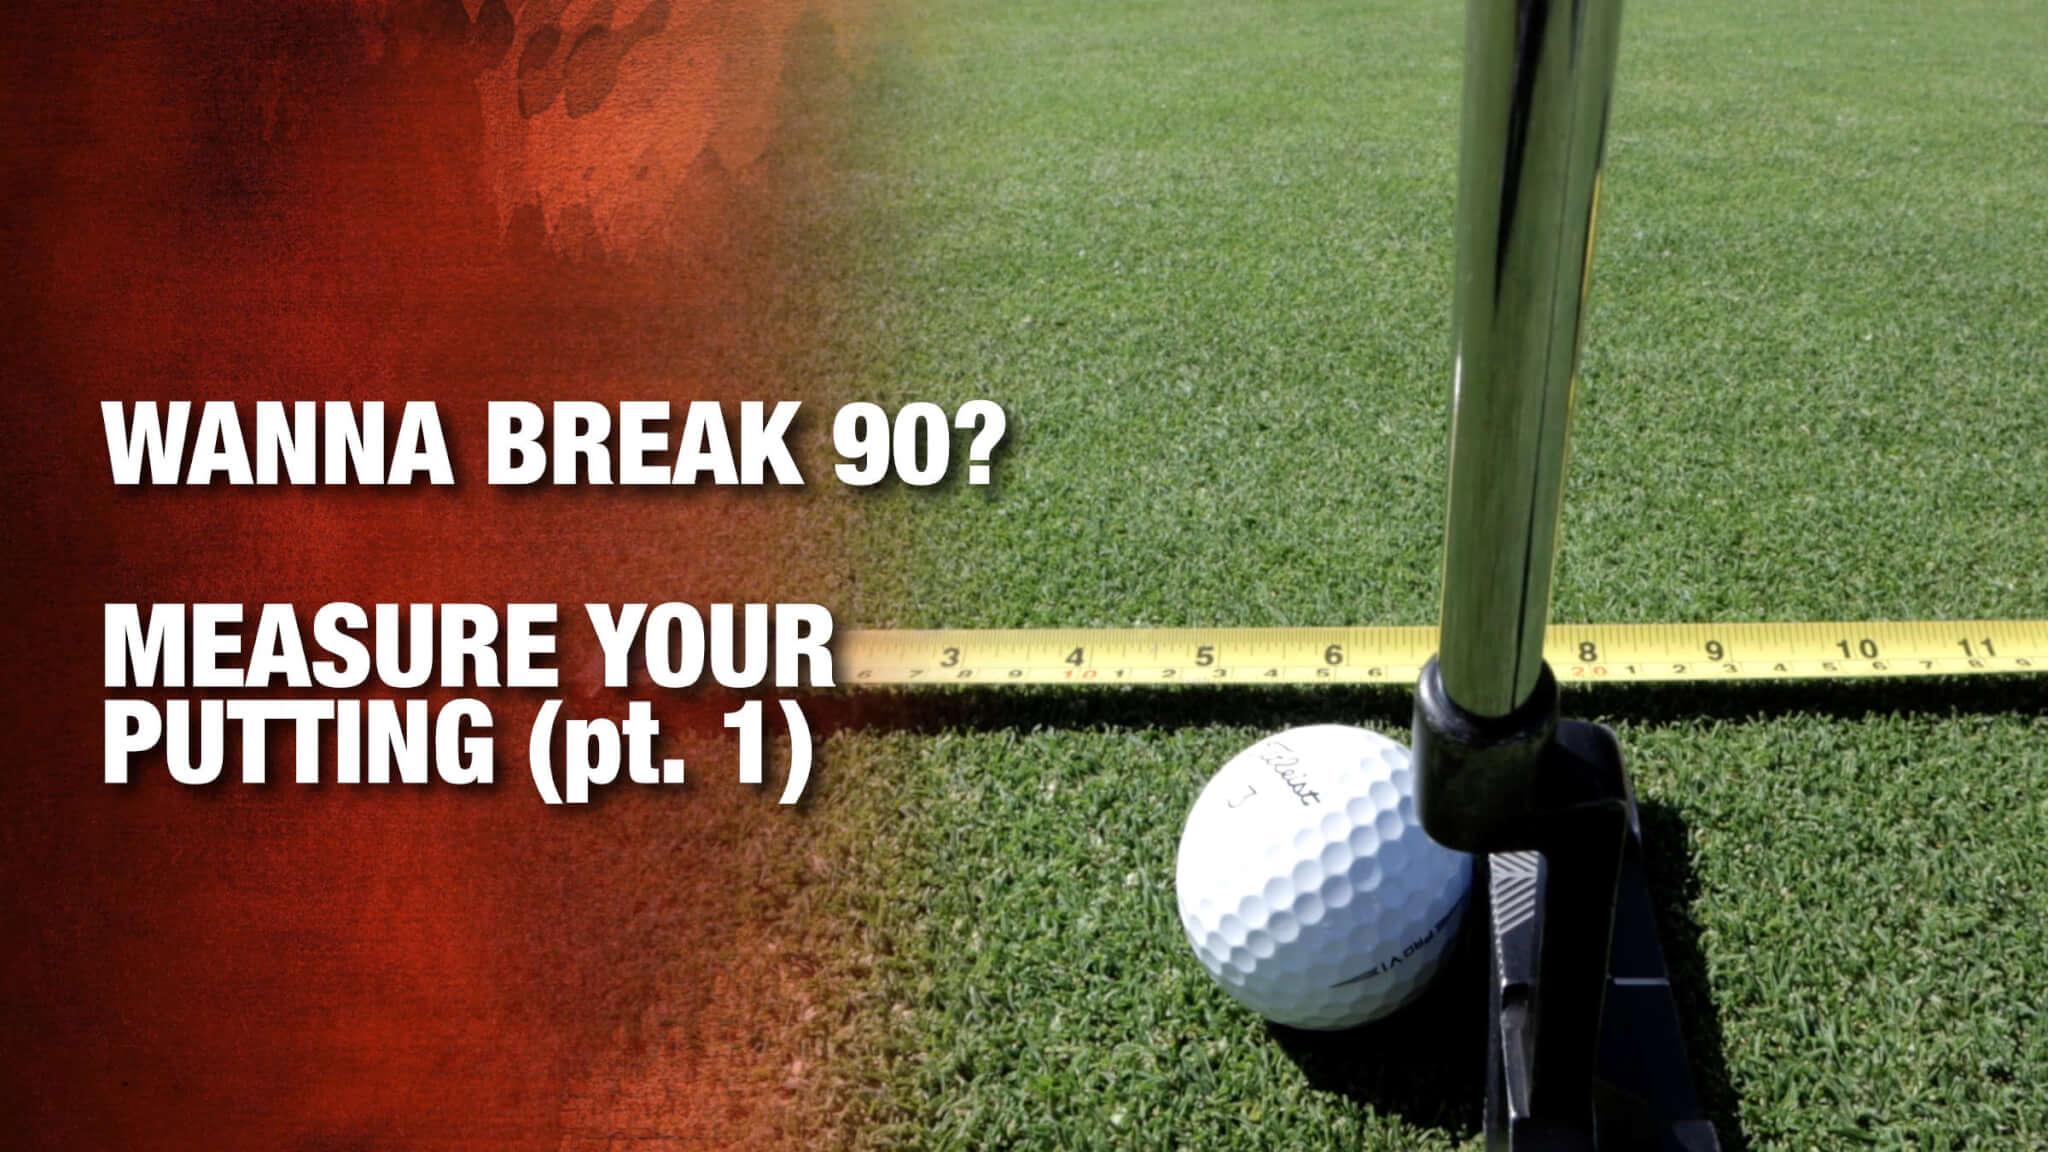 Wanna Break 90?  Measure Your Putting (pt. 1)